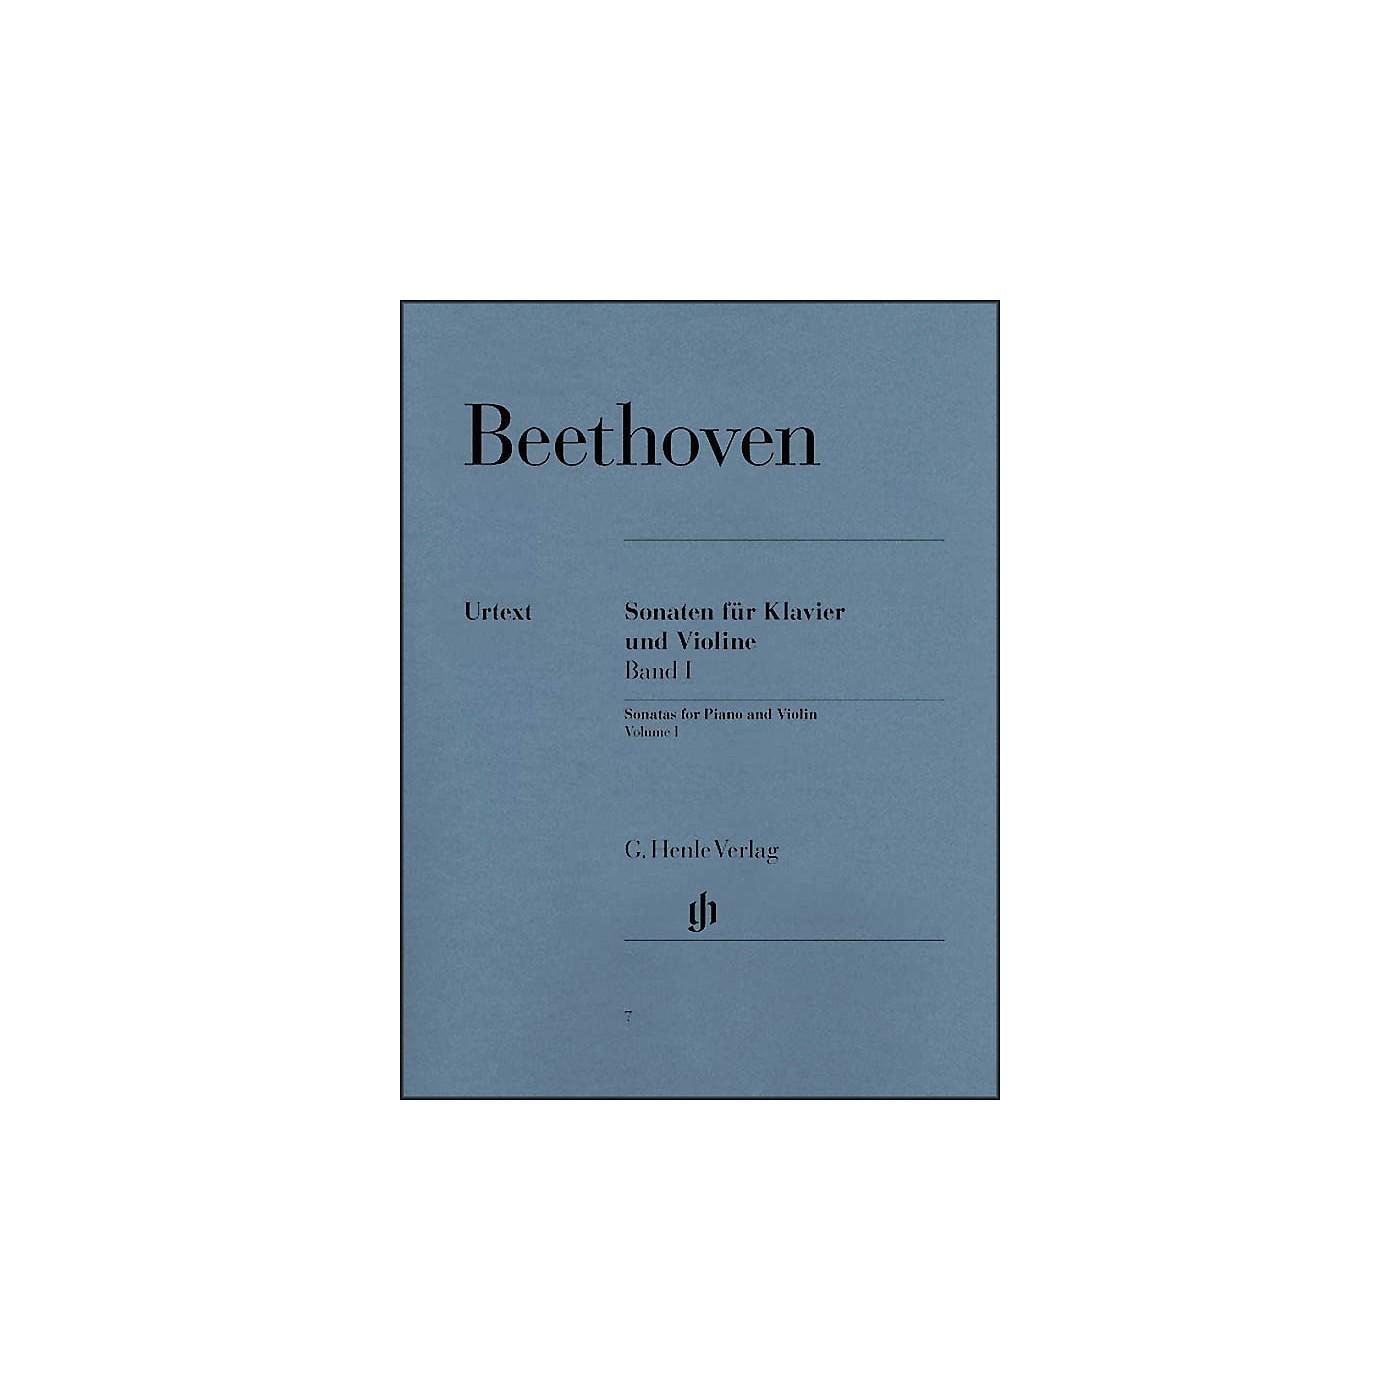 G. Henle Verlag Sonatas for Piano And Violin Volume I By Beethoven thumbnail